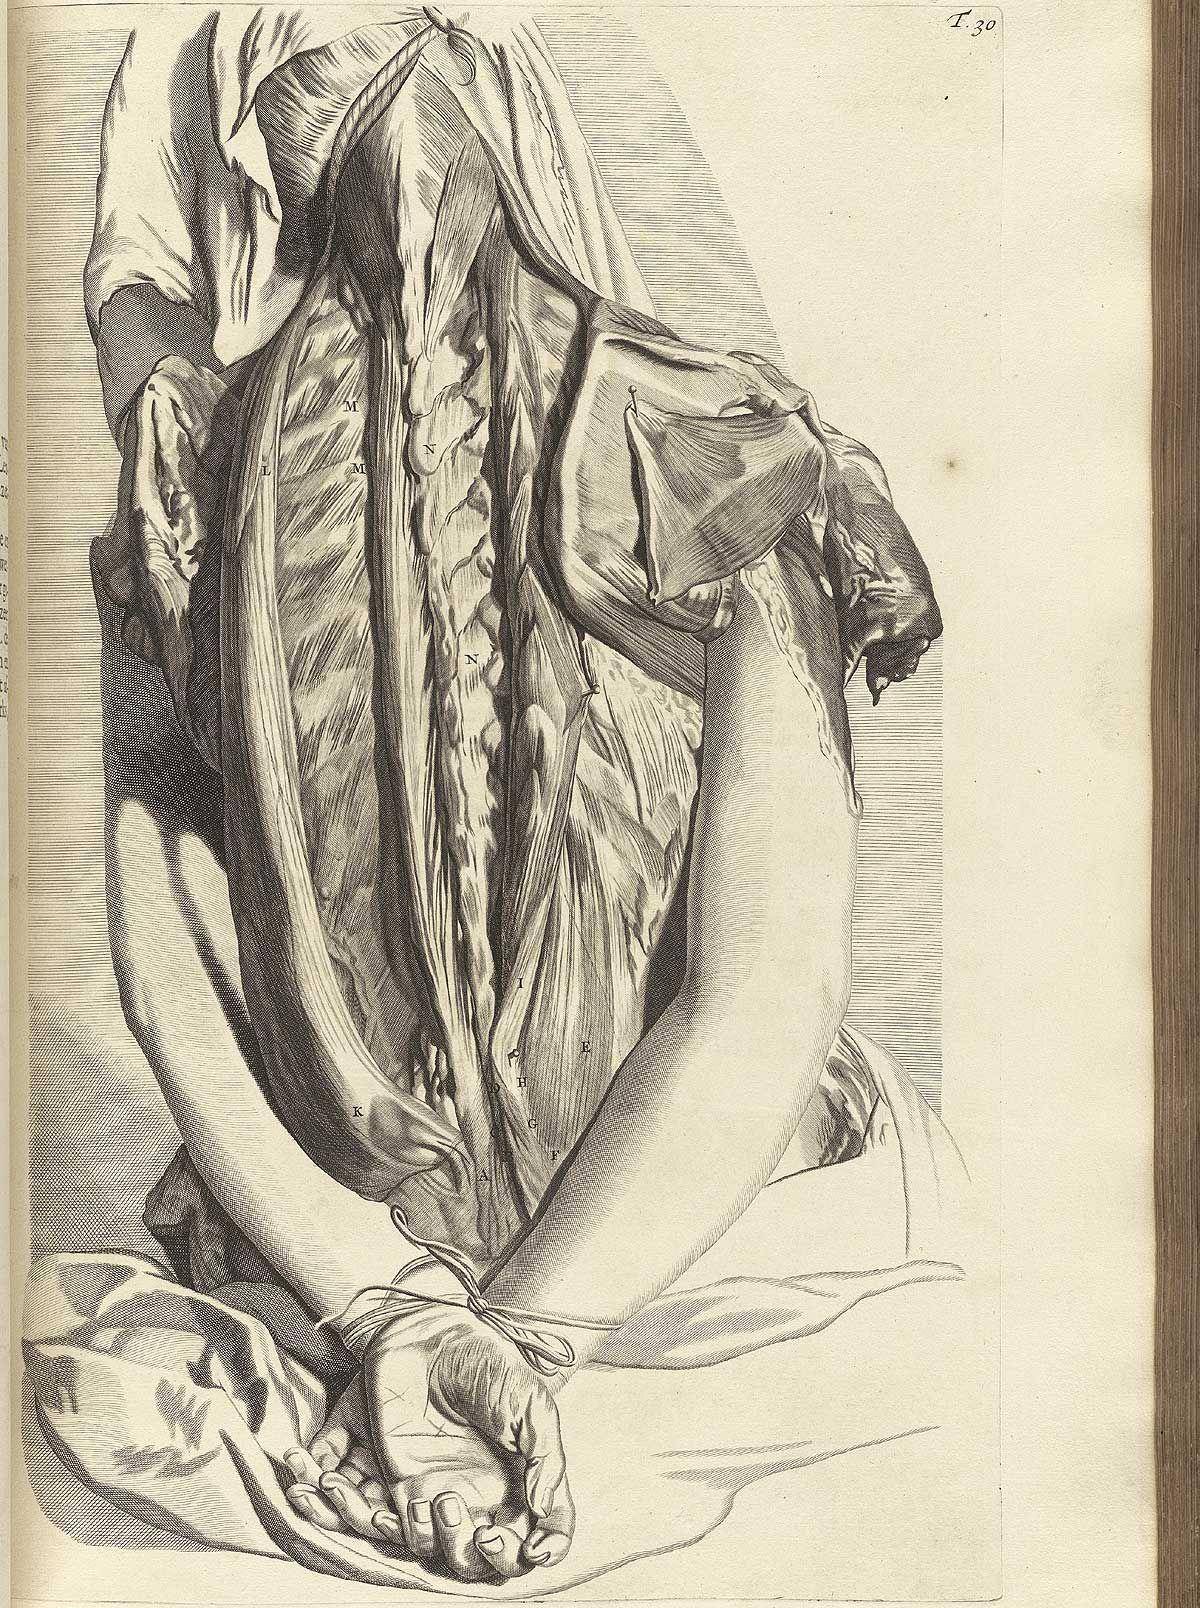 Govard Bidloo: Anatomia humani corporis